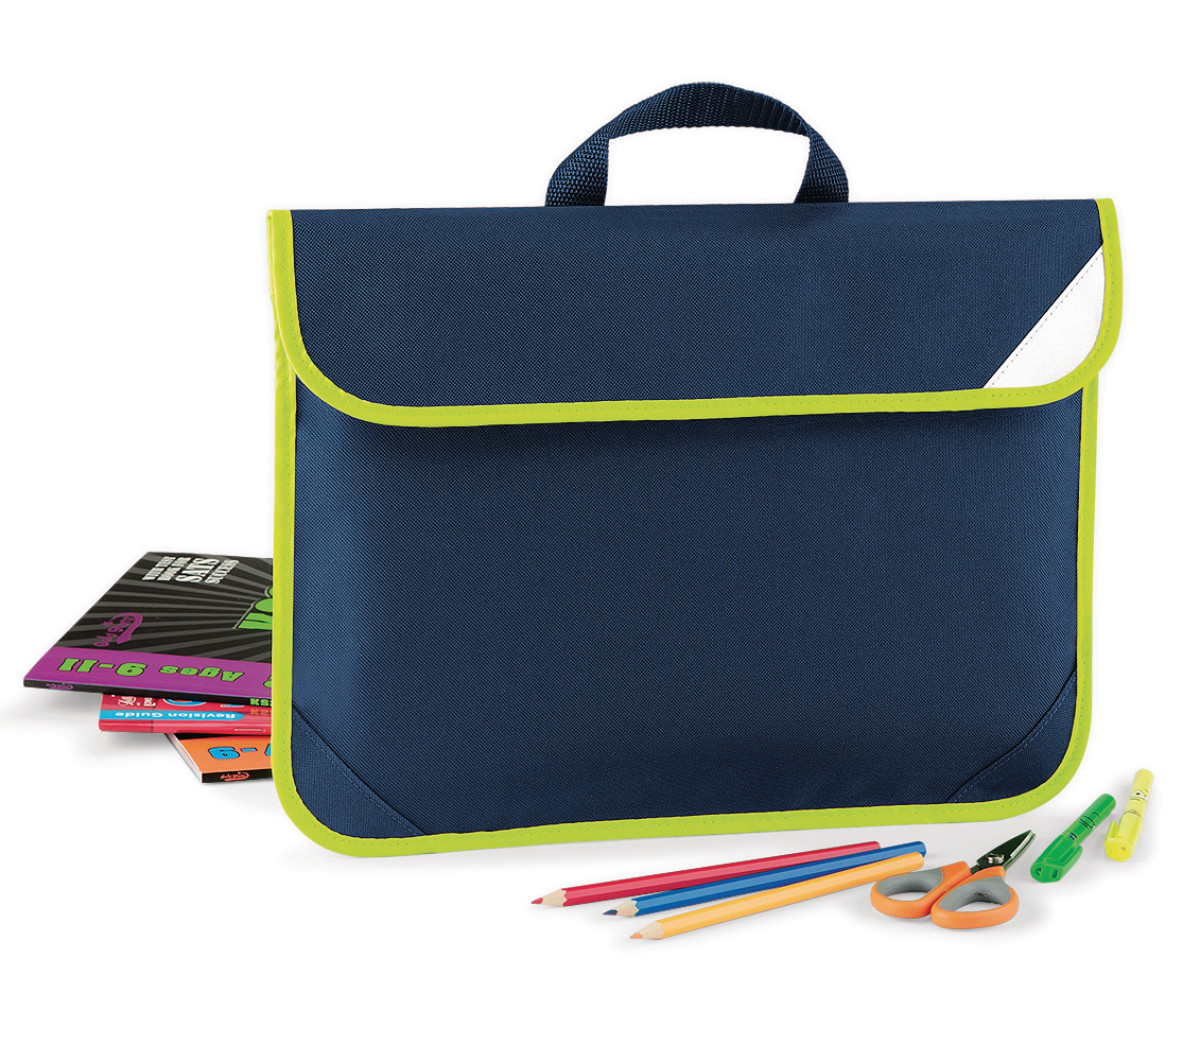 Enchanced-Viz Book Bag